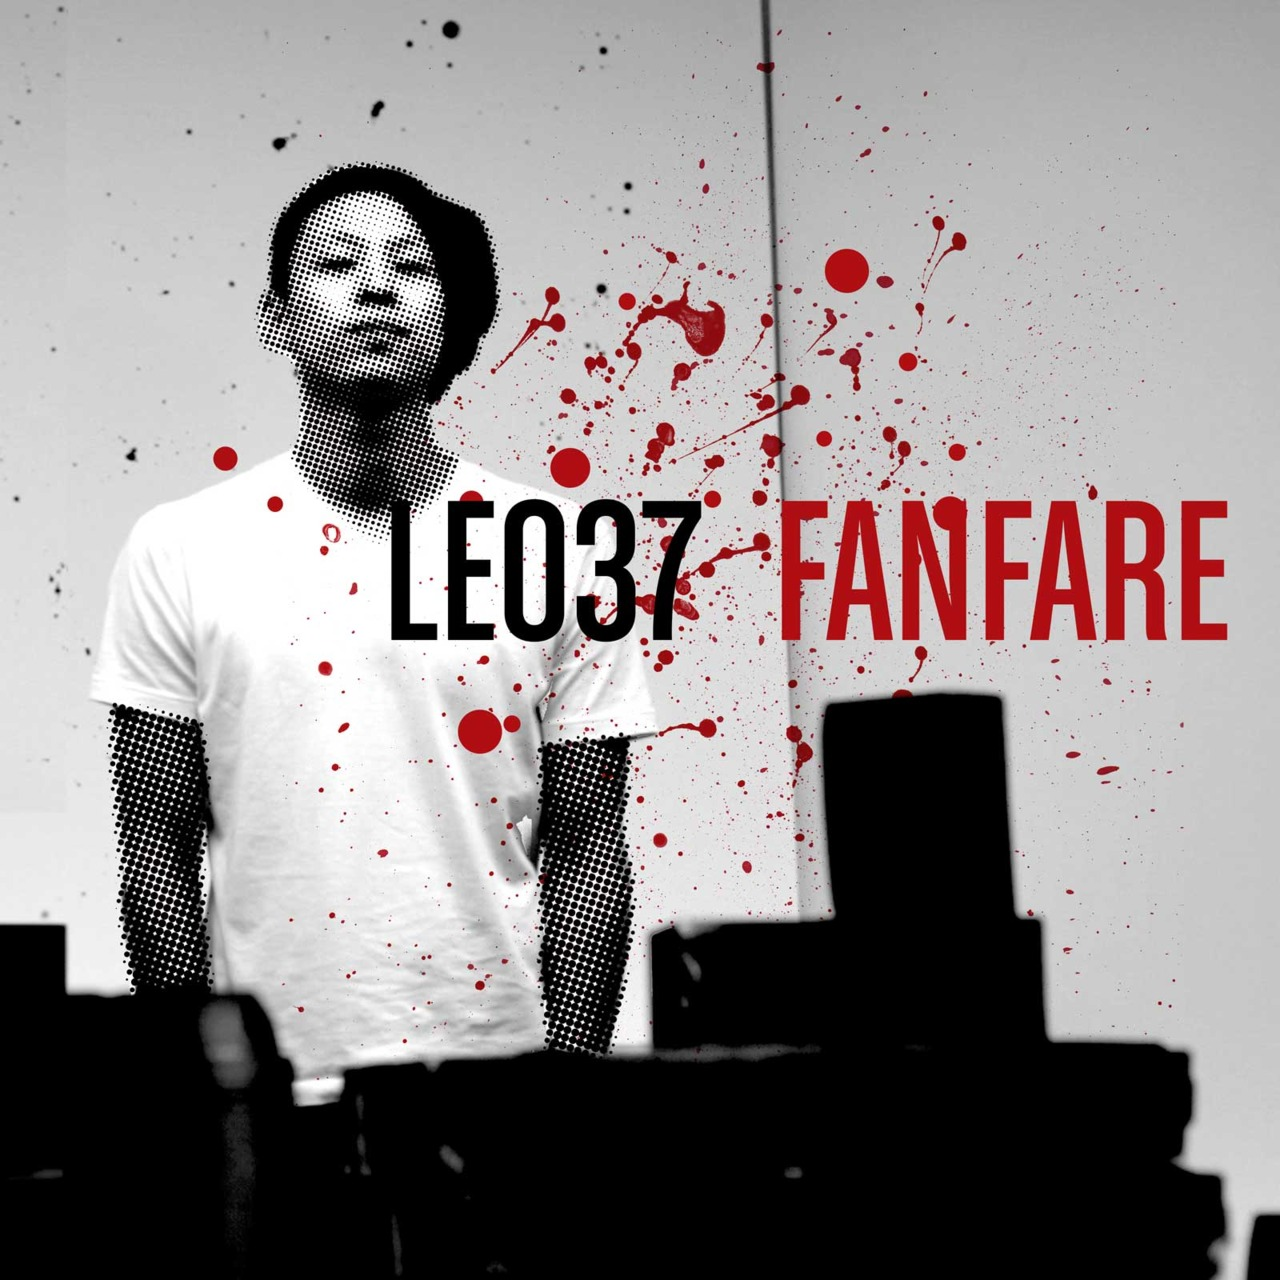 LEO37: Download Now